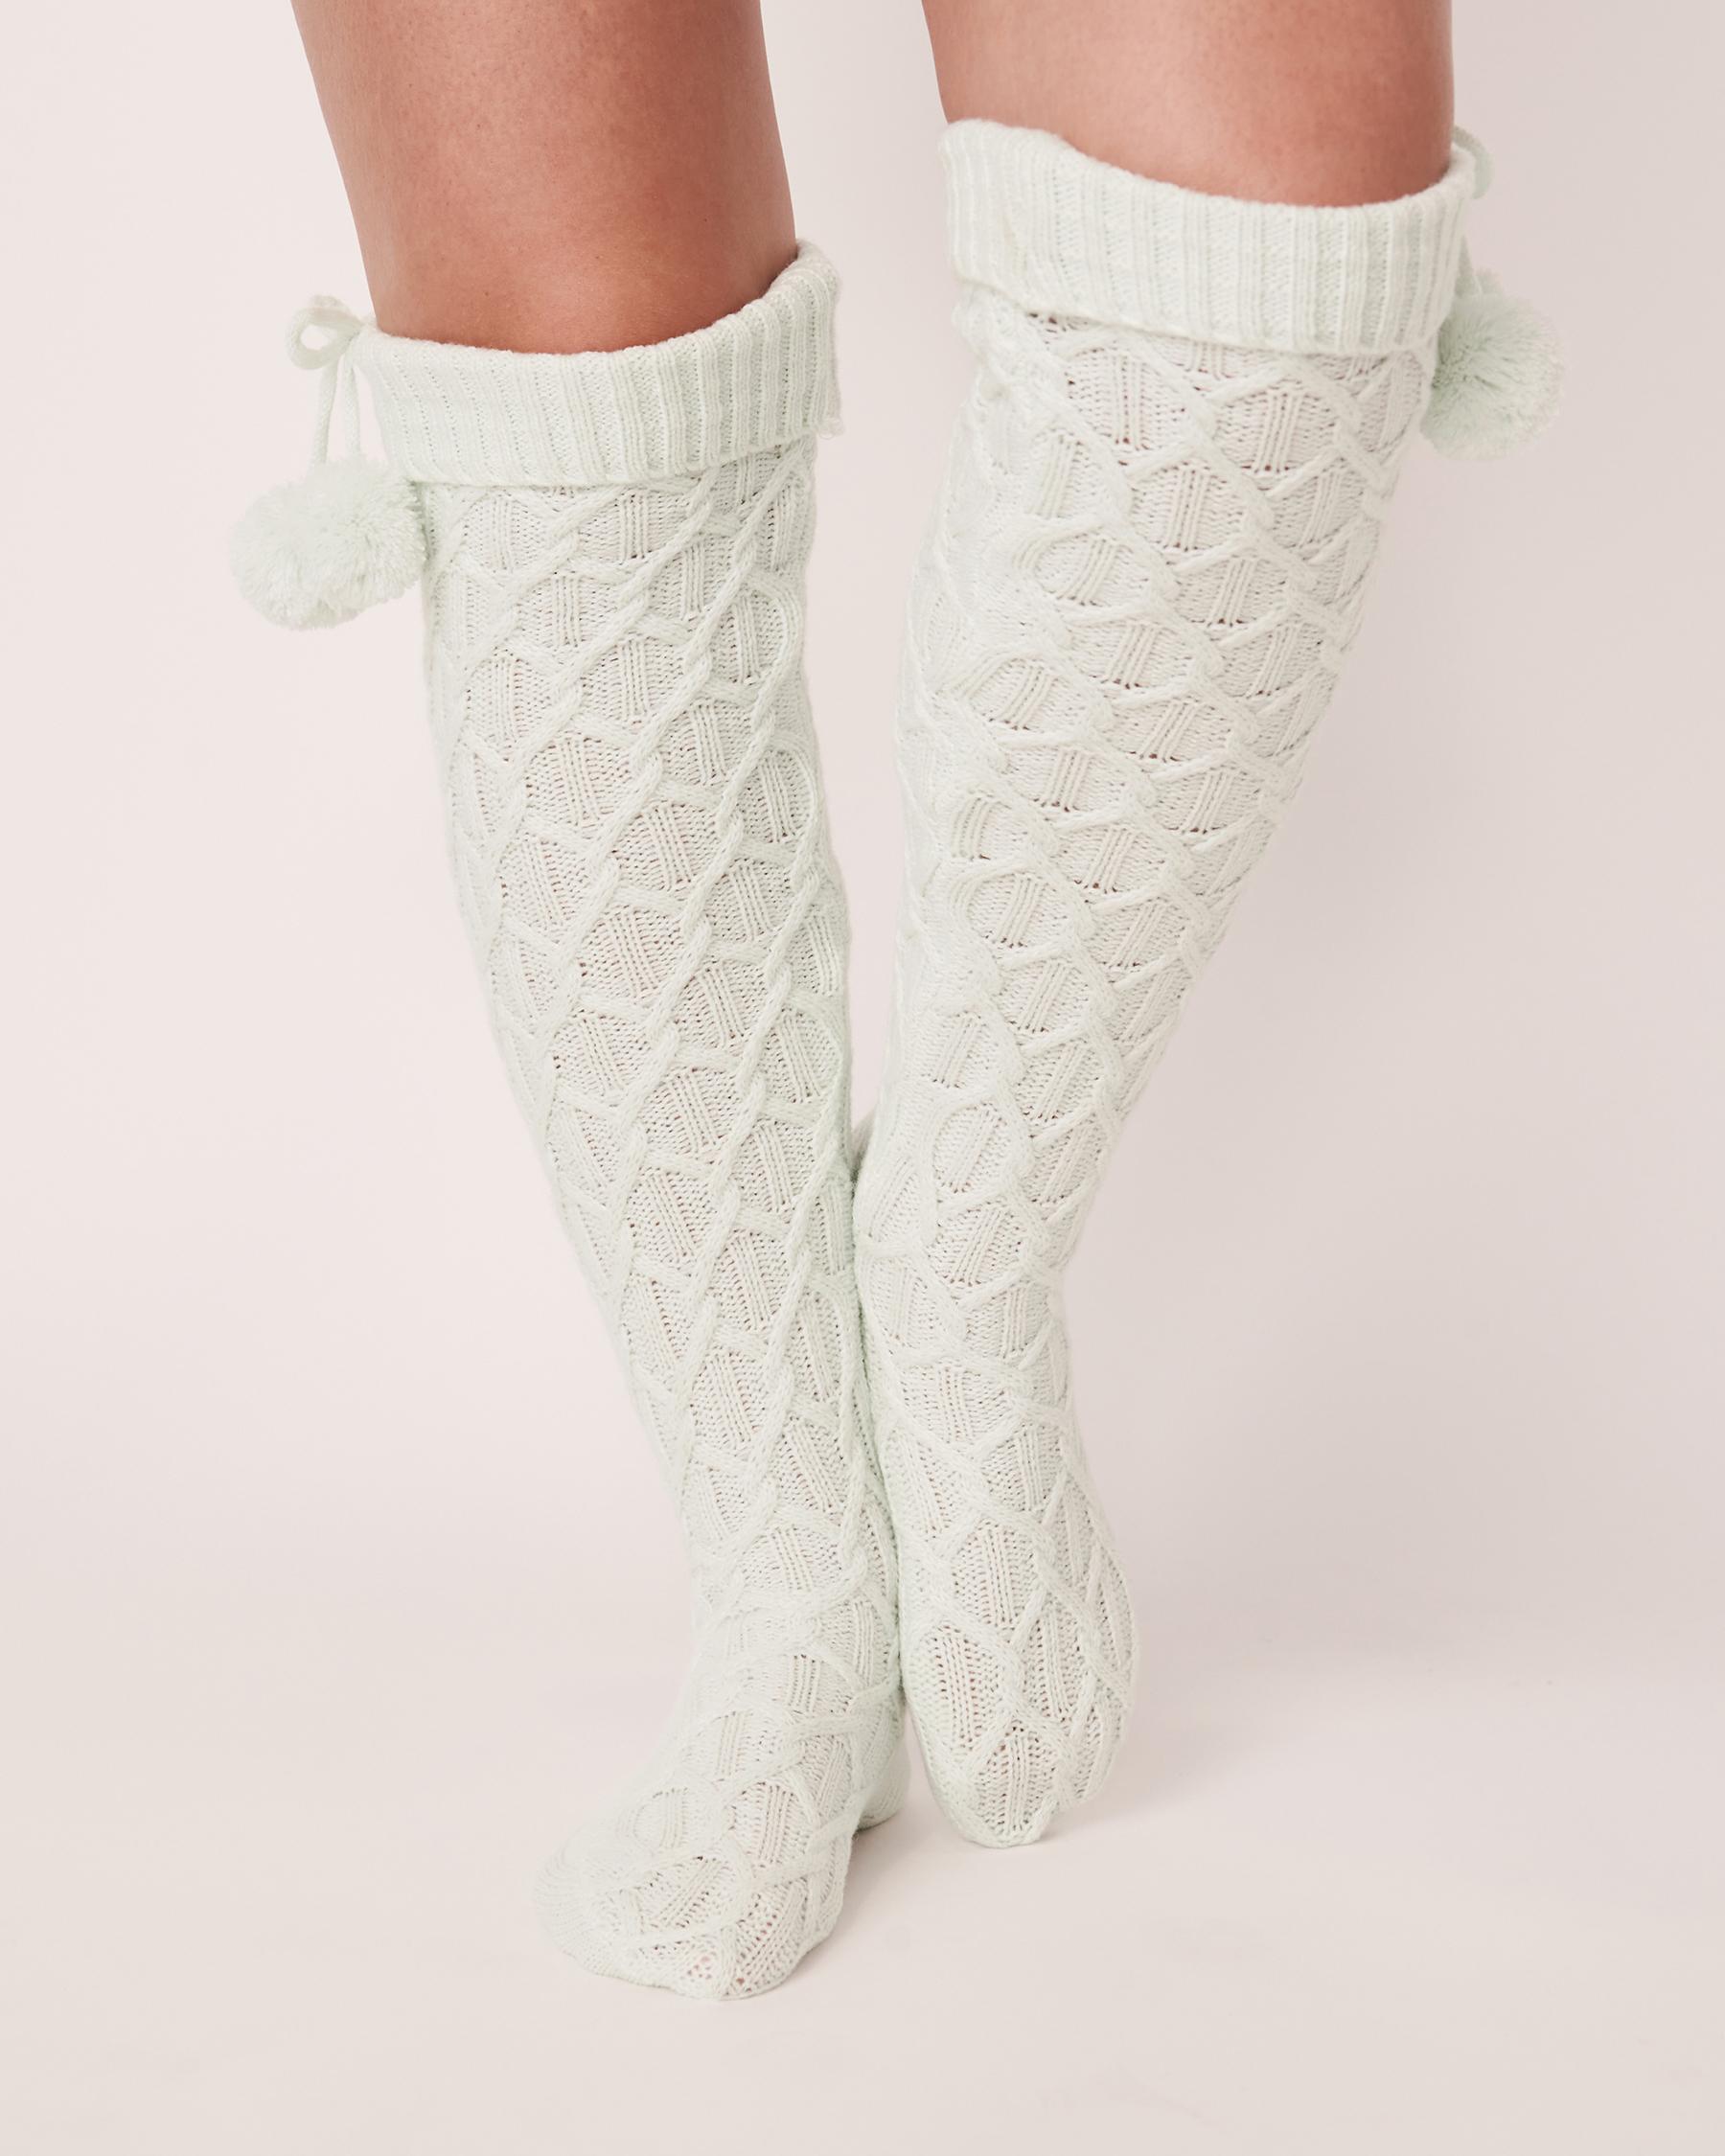 LA VIE EN ROSE Knitted Knee-high Socks Light aqua 40700079 - View1